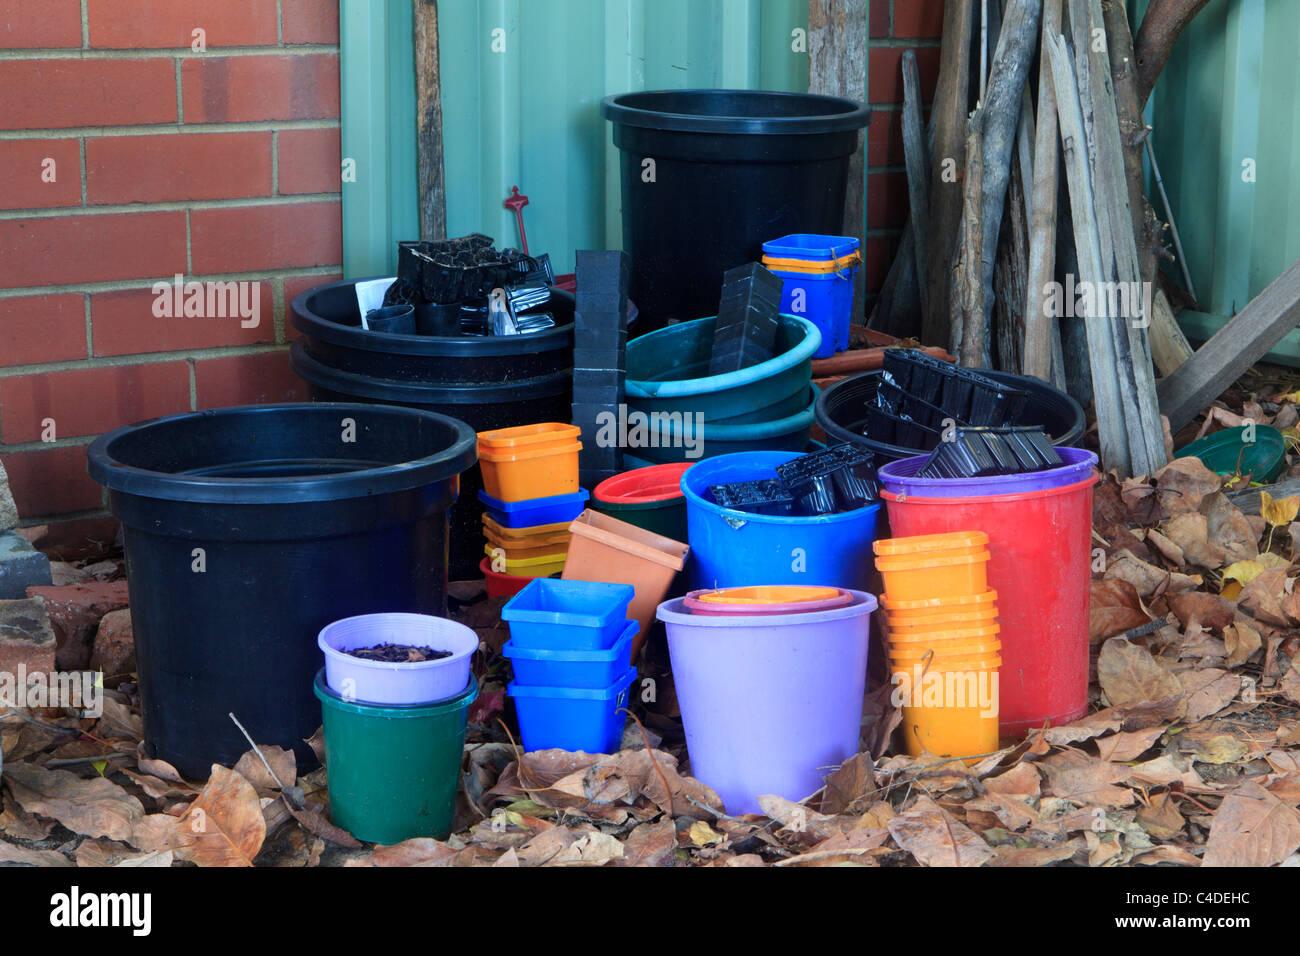 Plastic plant pots - Stock Image